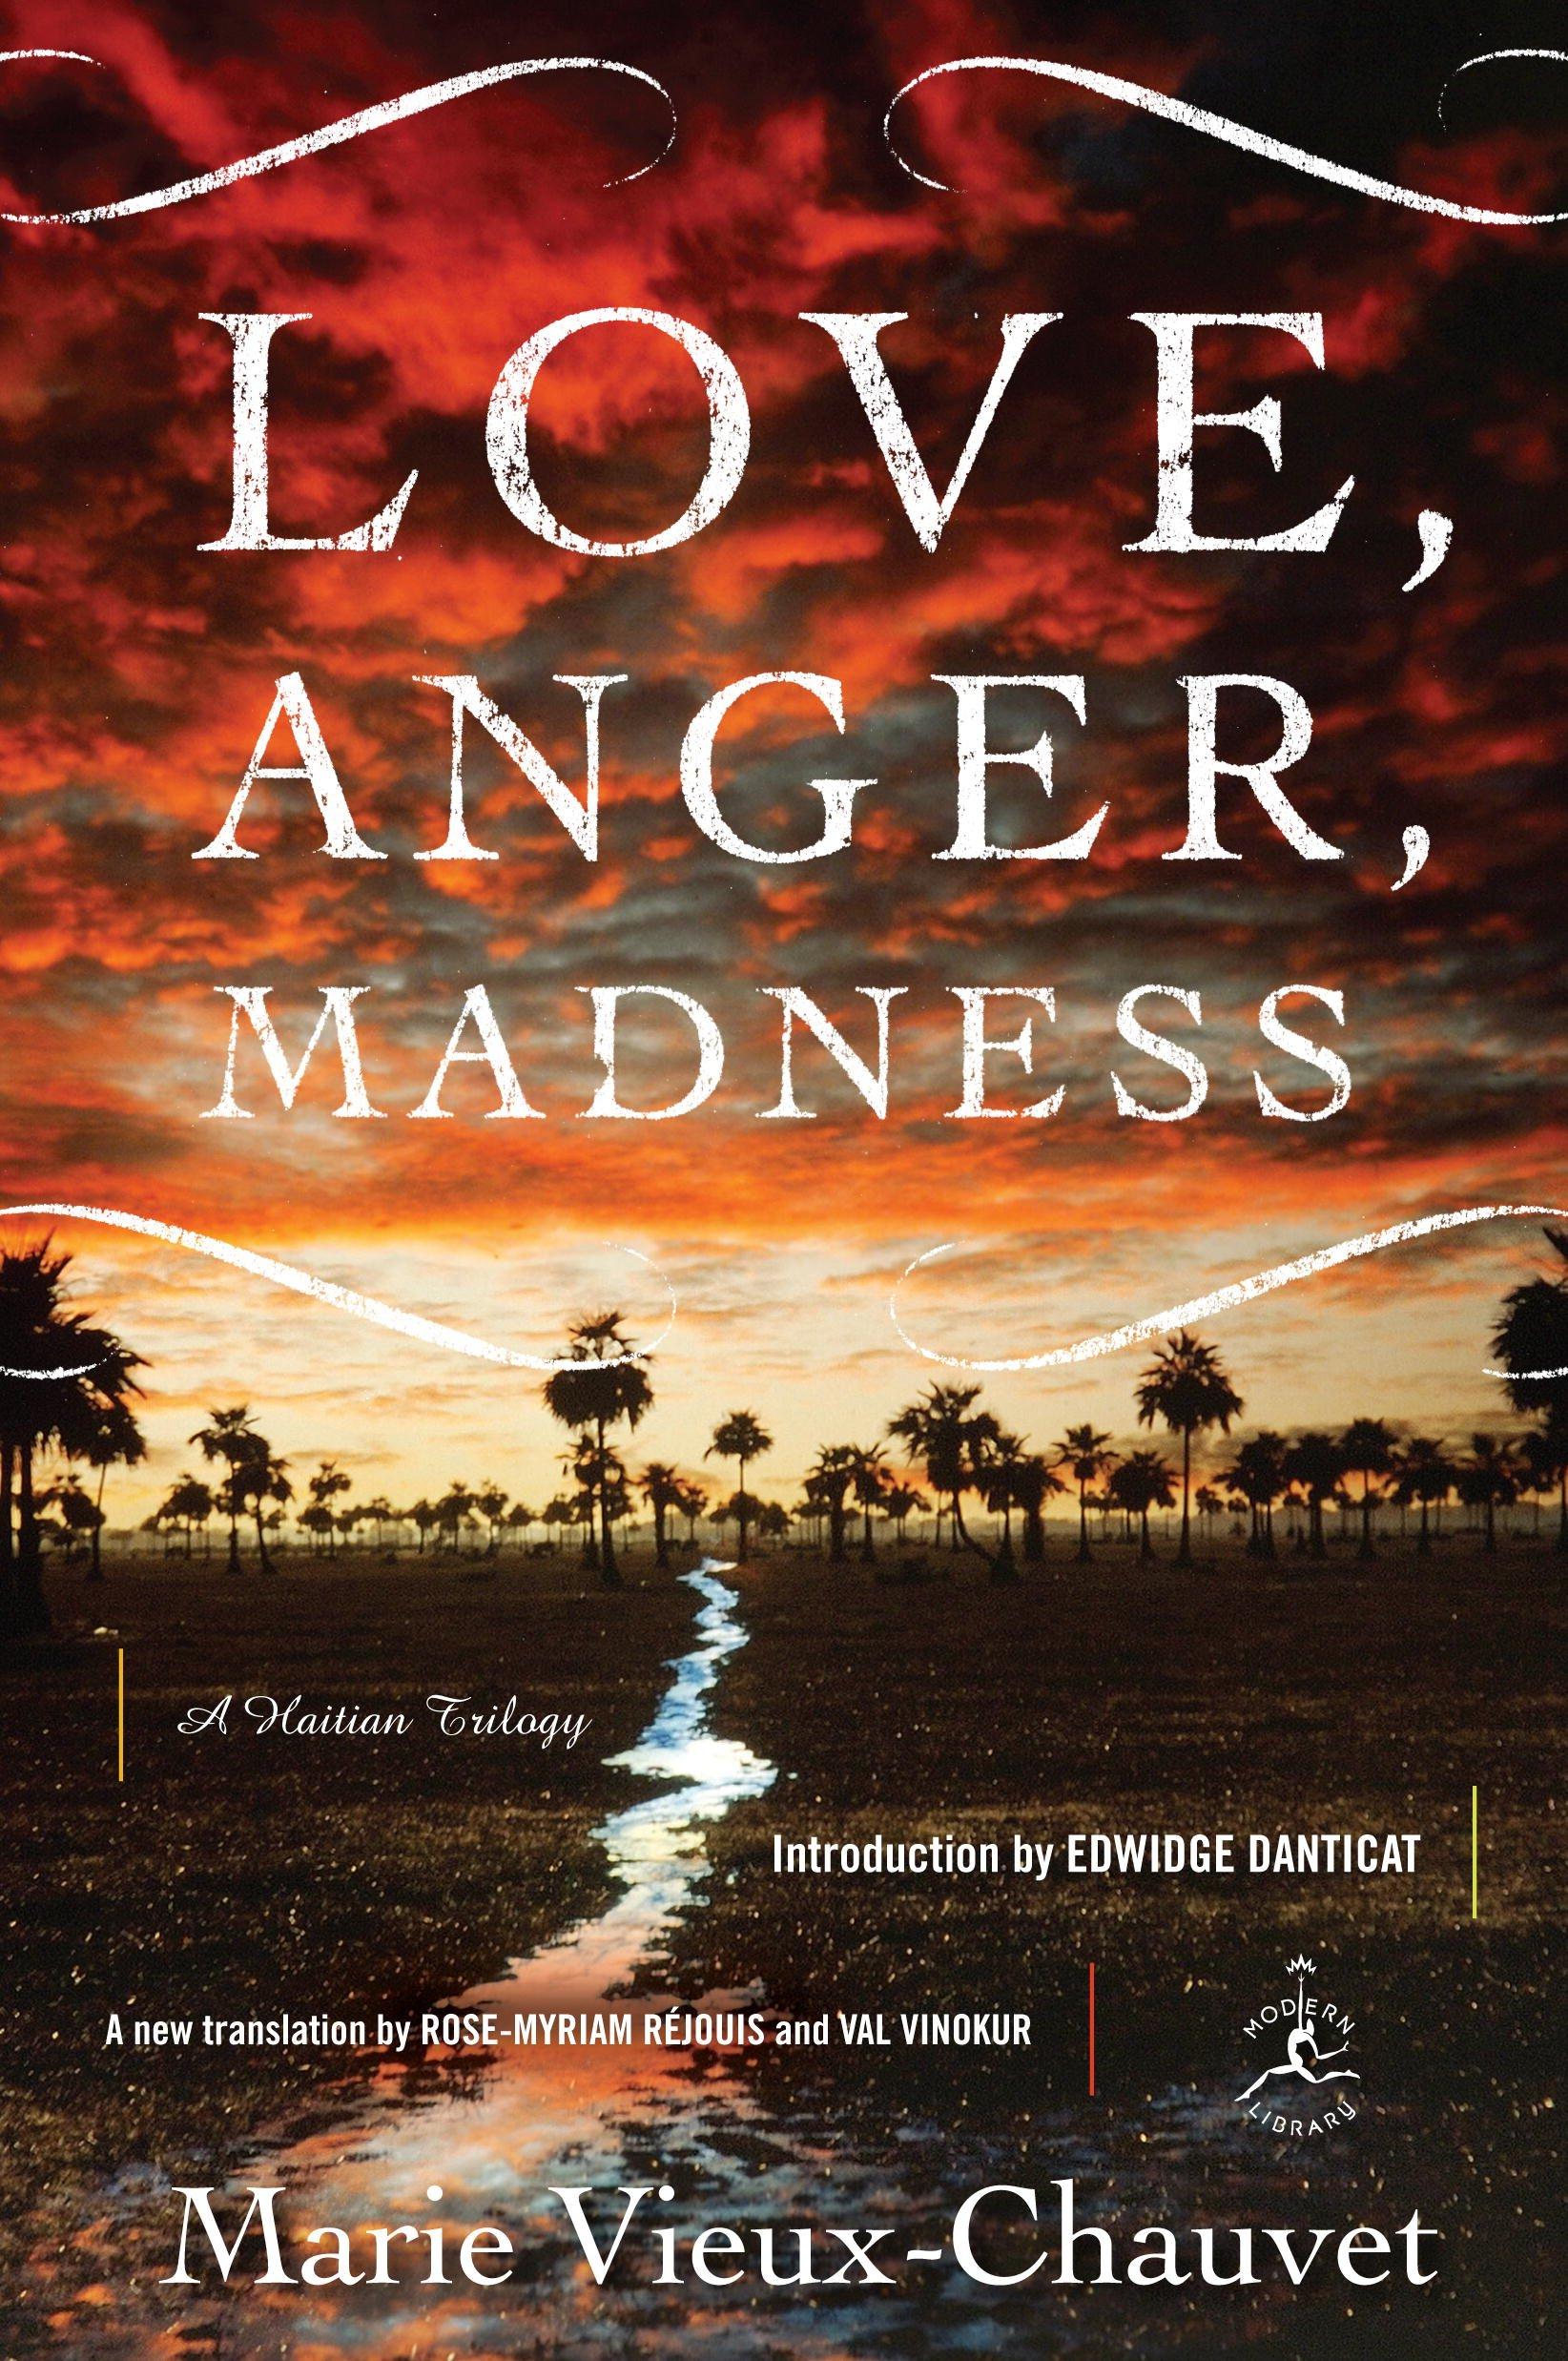 Anger, Madness: A Haitian Trilogy (modern Library) (9780679643517):  Marie Vieuxchauvet, Rosemyriam Rejouis, Val Vinokur, Edwidge Danticat:  Books